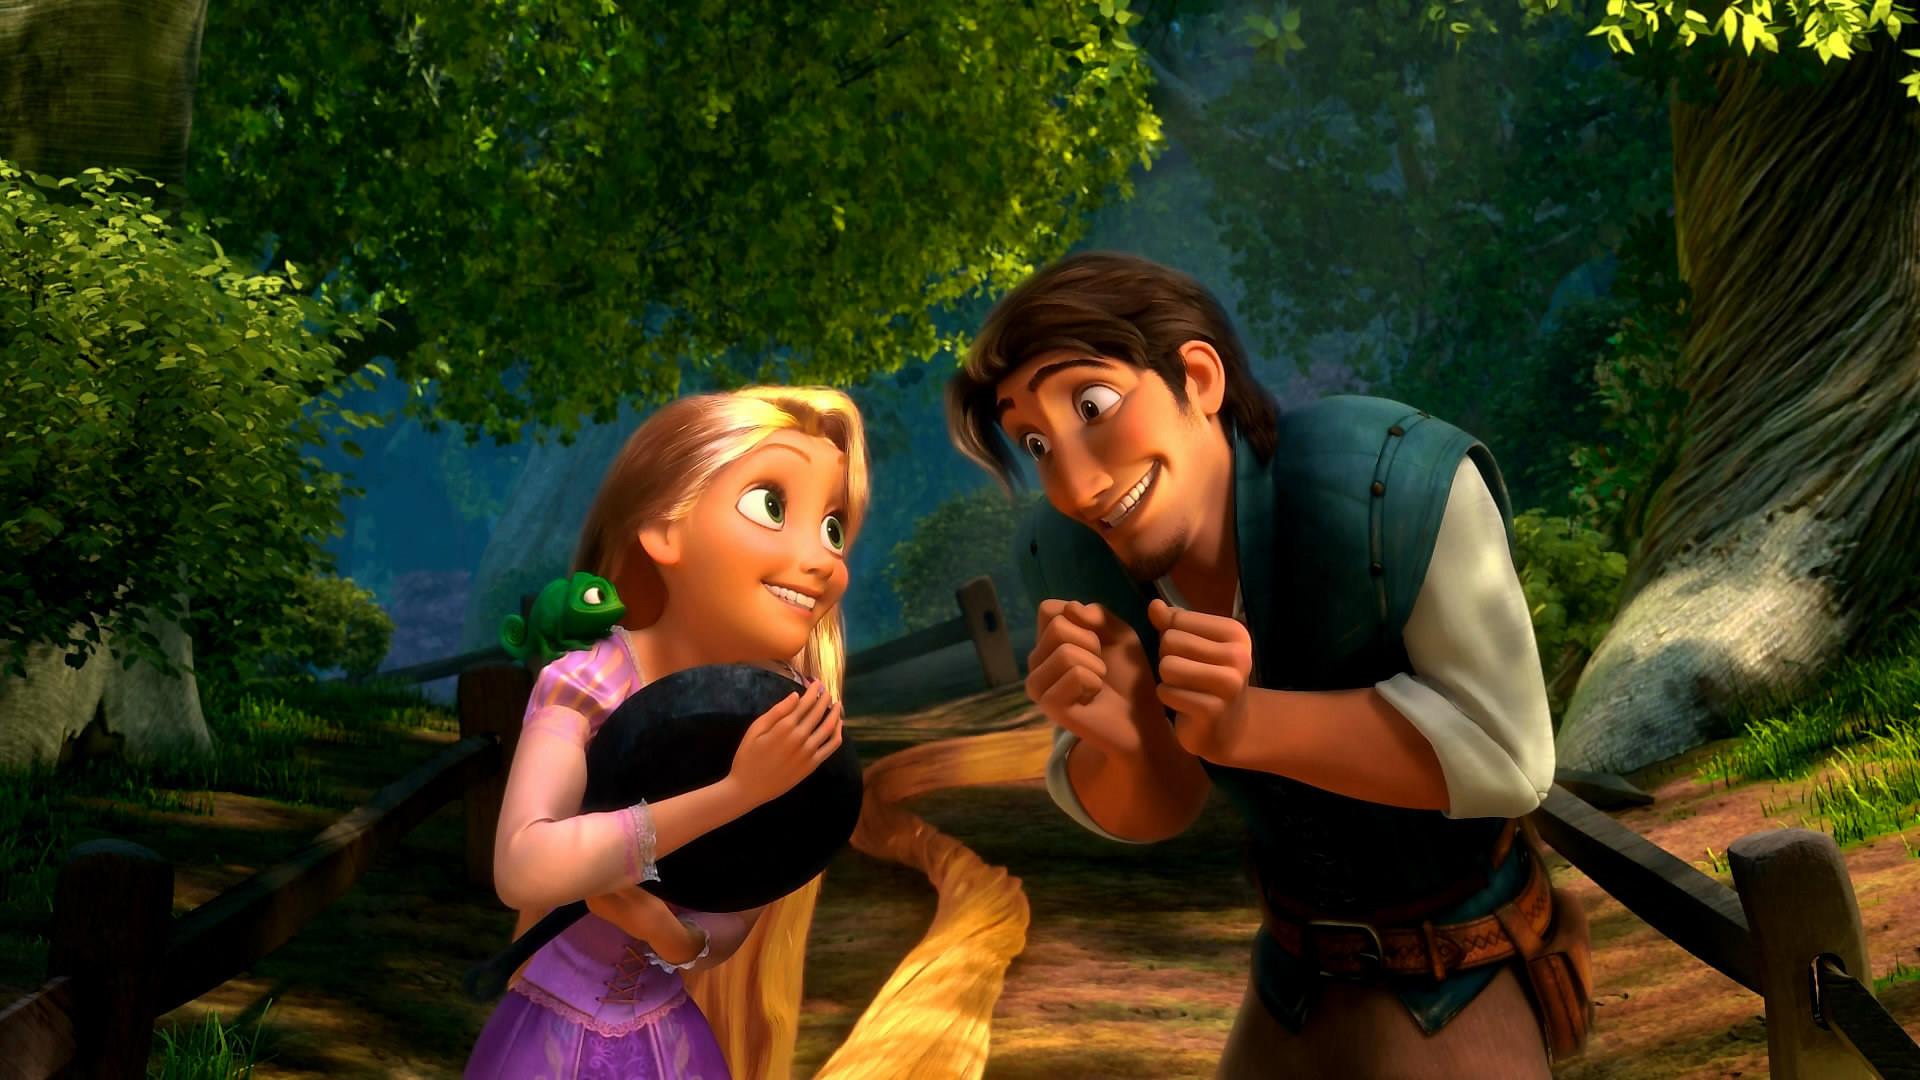 Tangled Animated Film Cute R